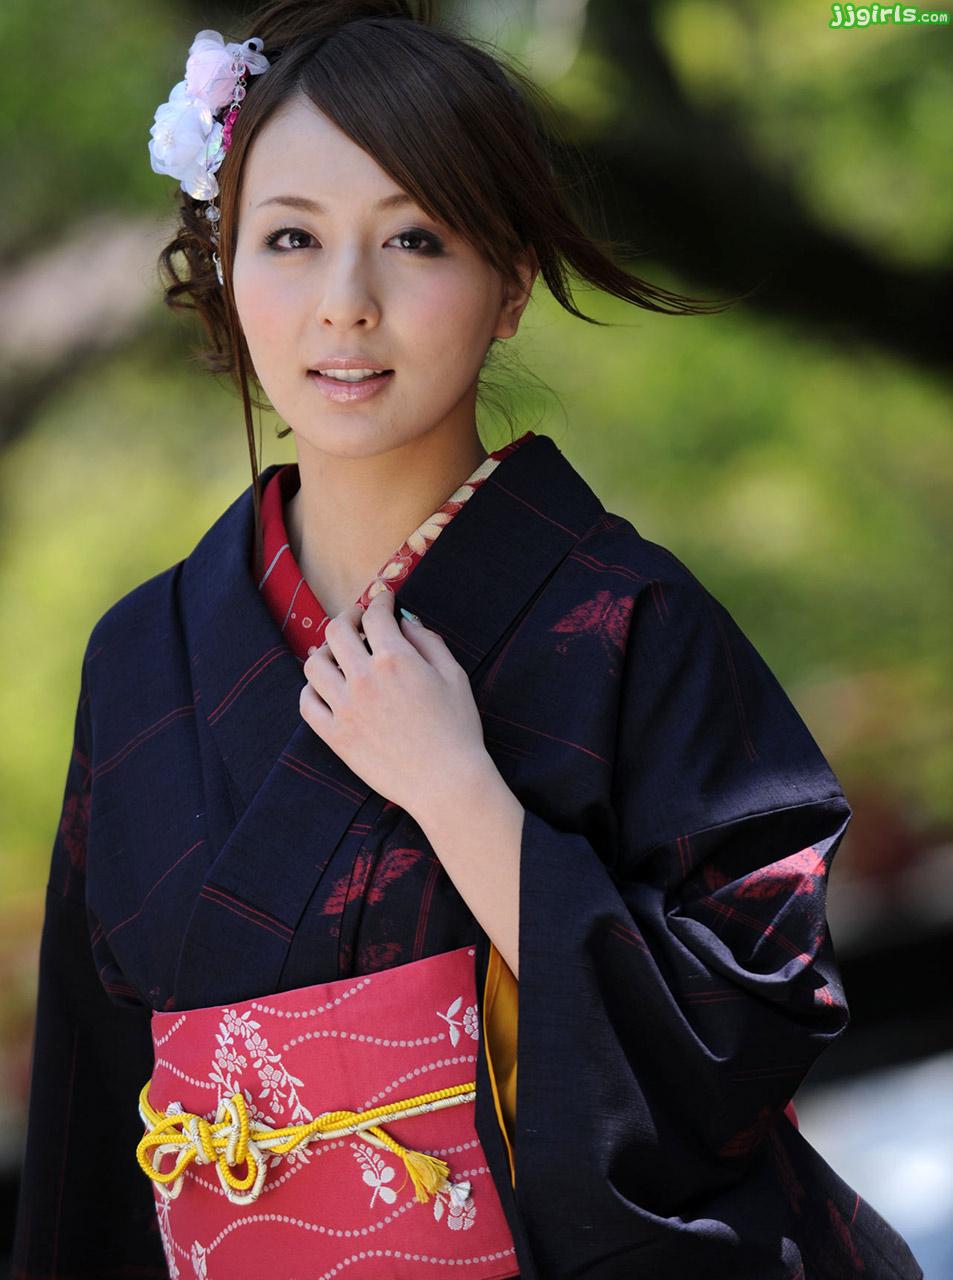 kaede-matsumoto-pics-8-gallery